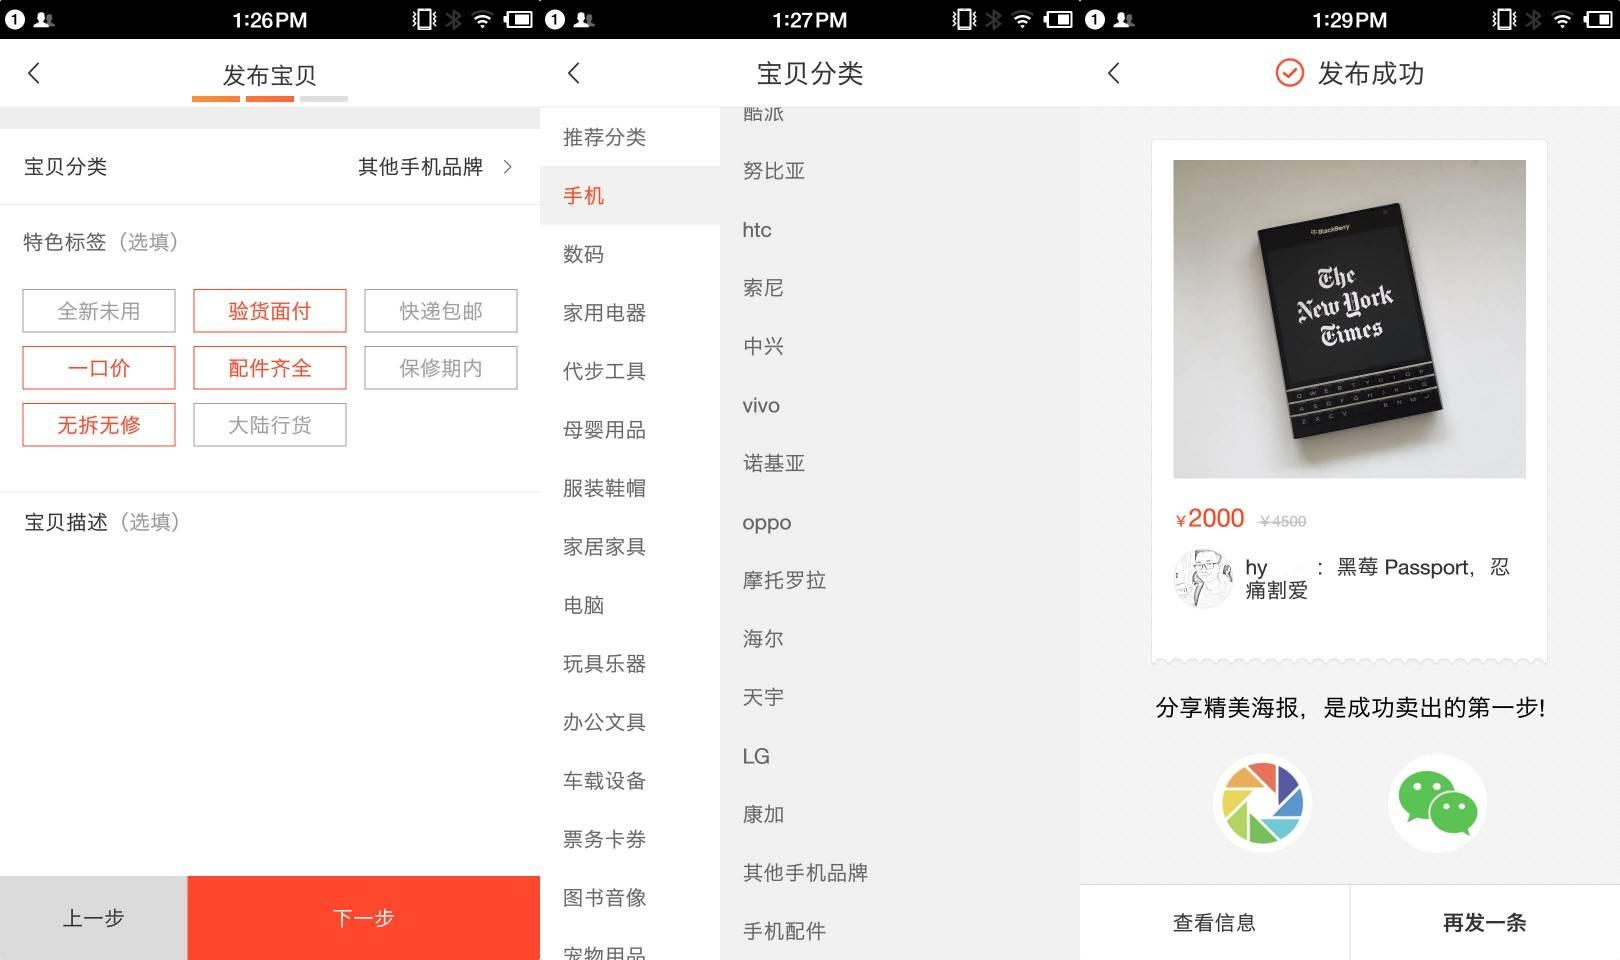 zhuanzhuan BlackBerry Passport Tencent Alibaba